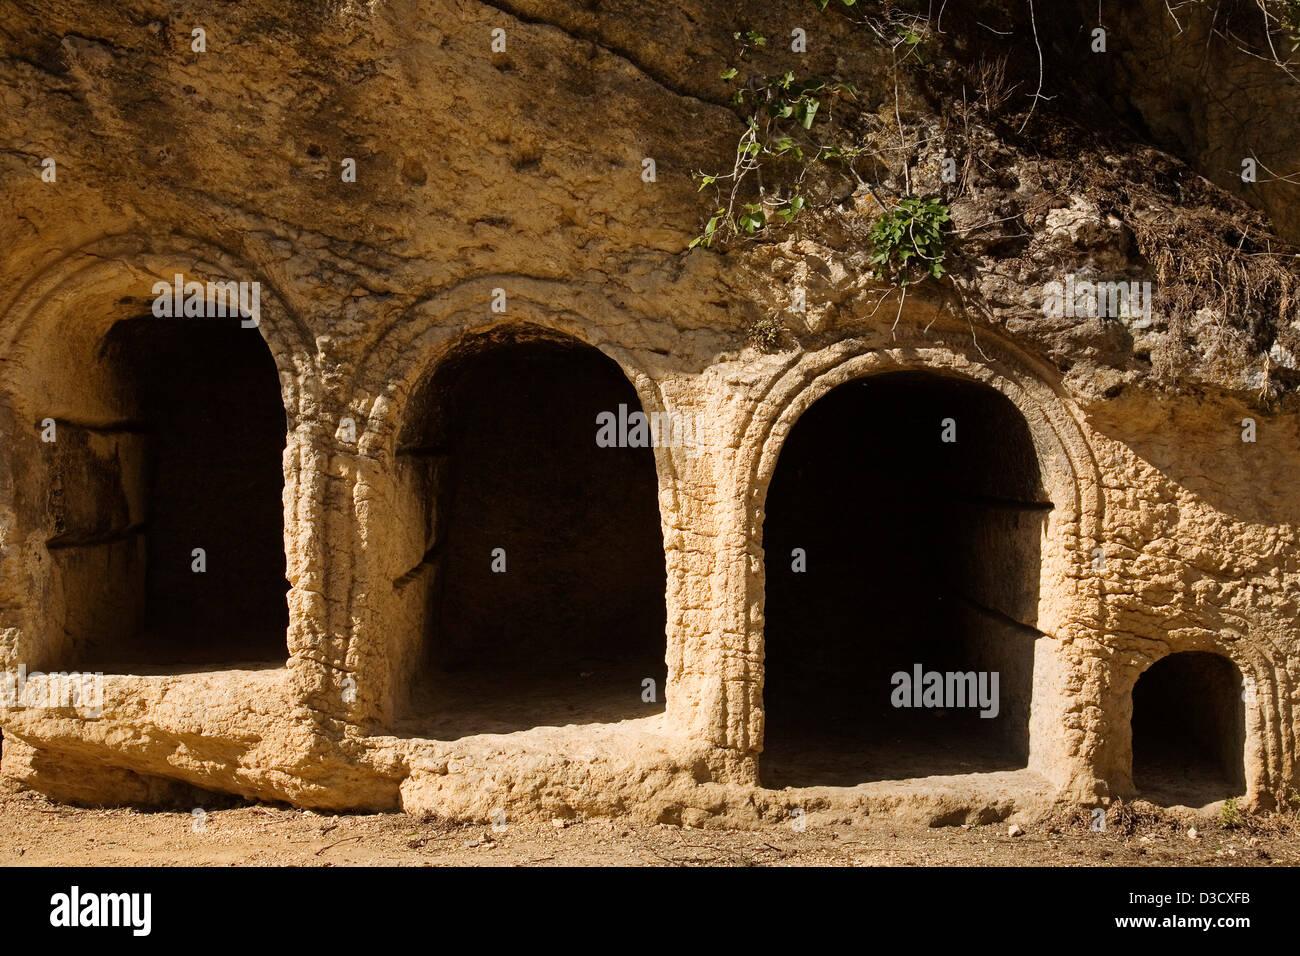 Christian necropolis Montefrio village Granada Andalusia Spain - Stock Image